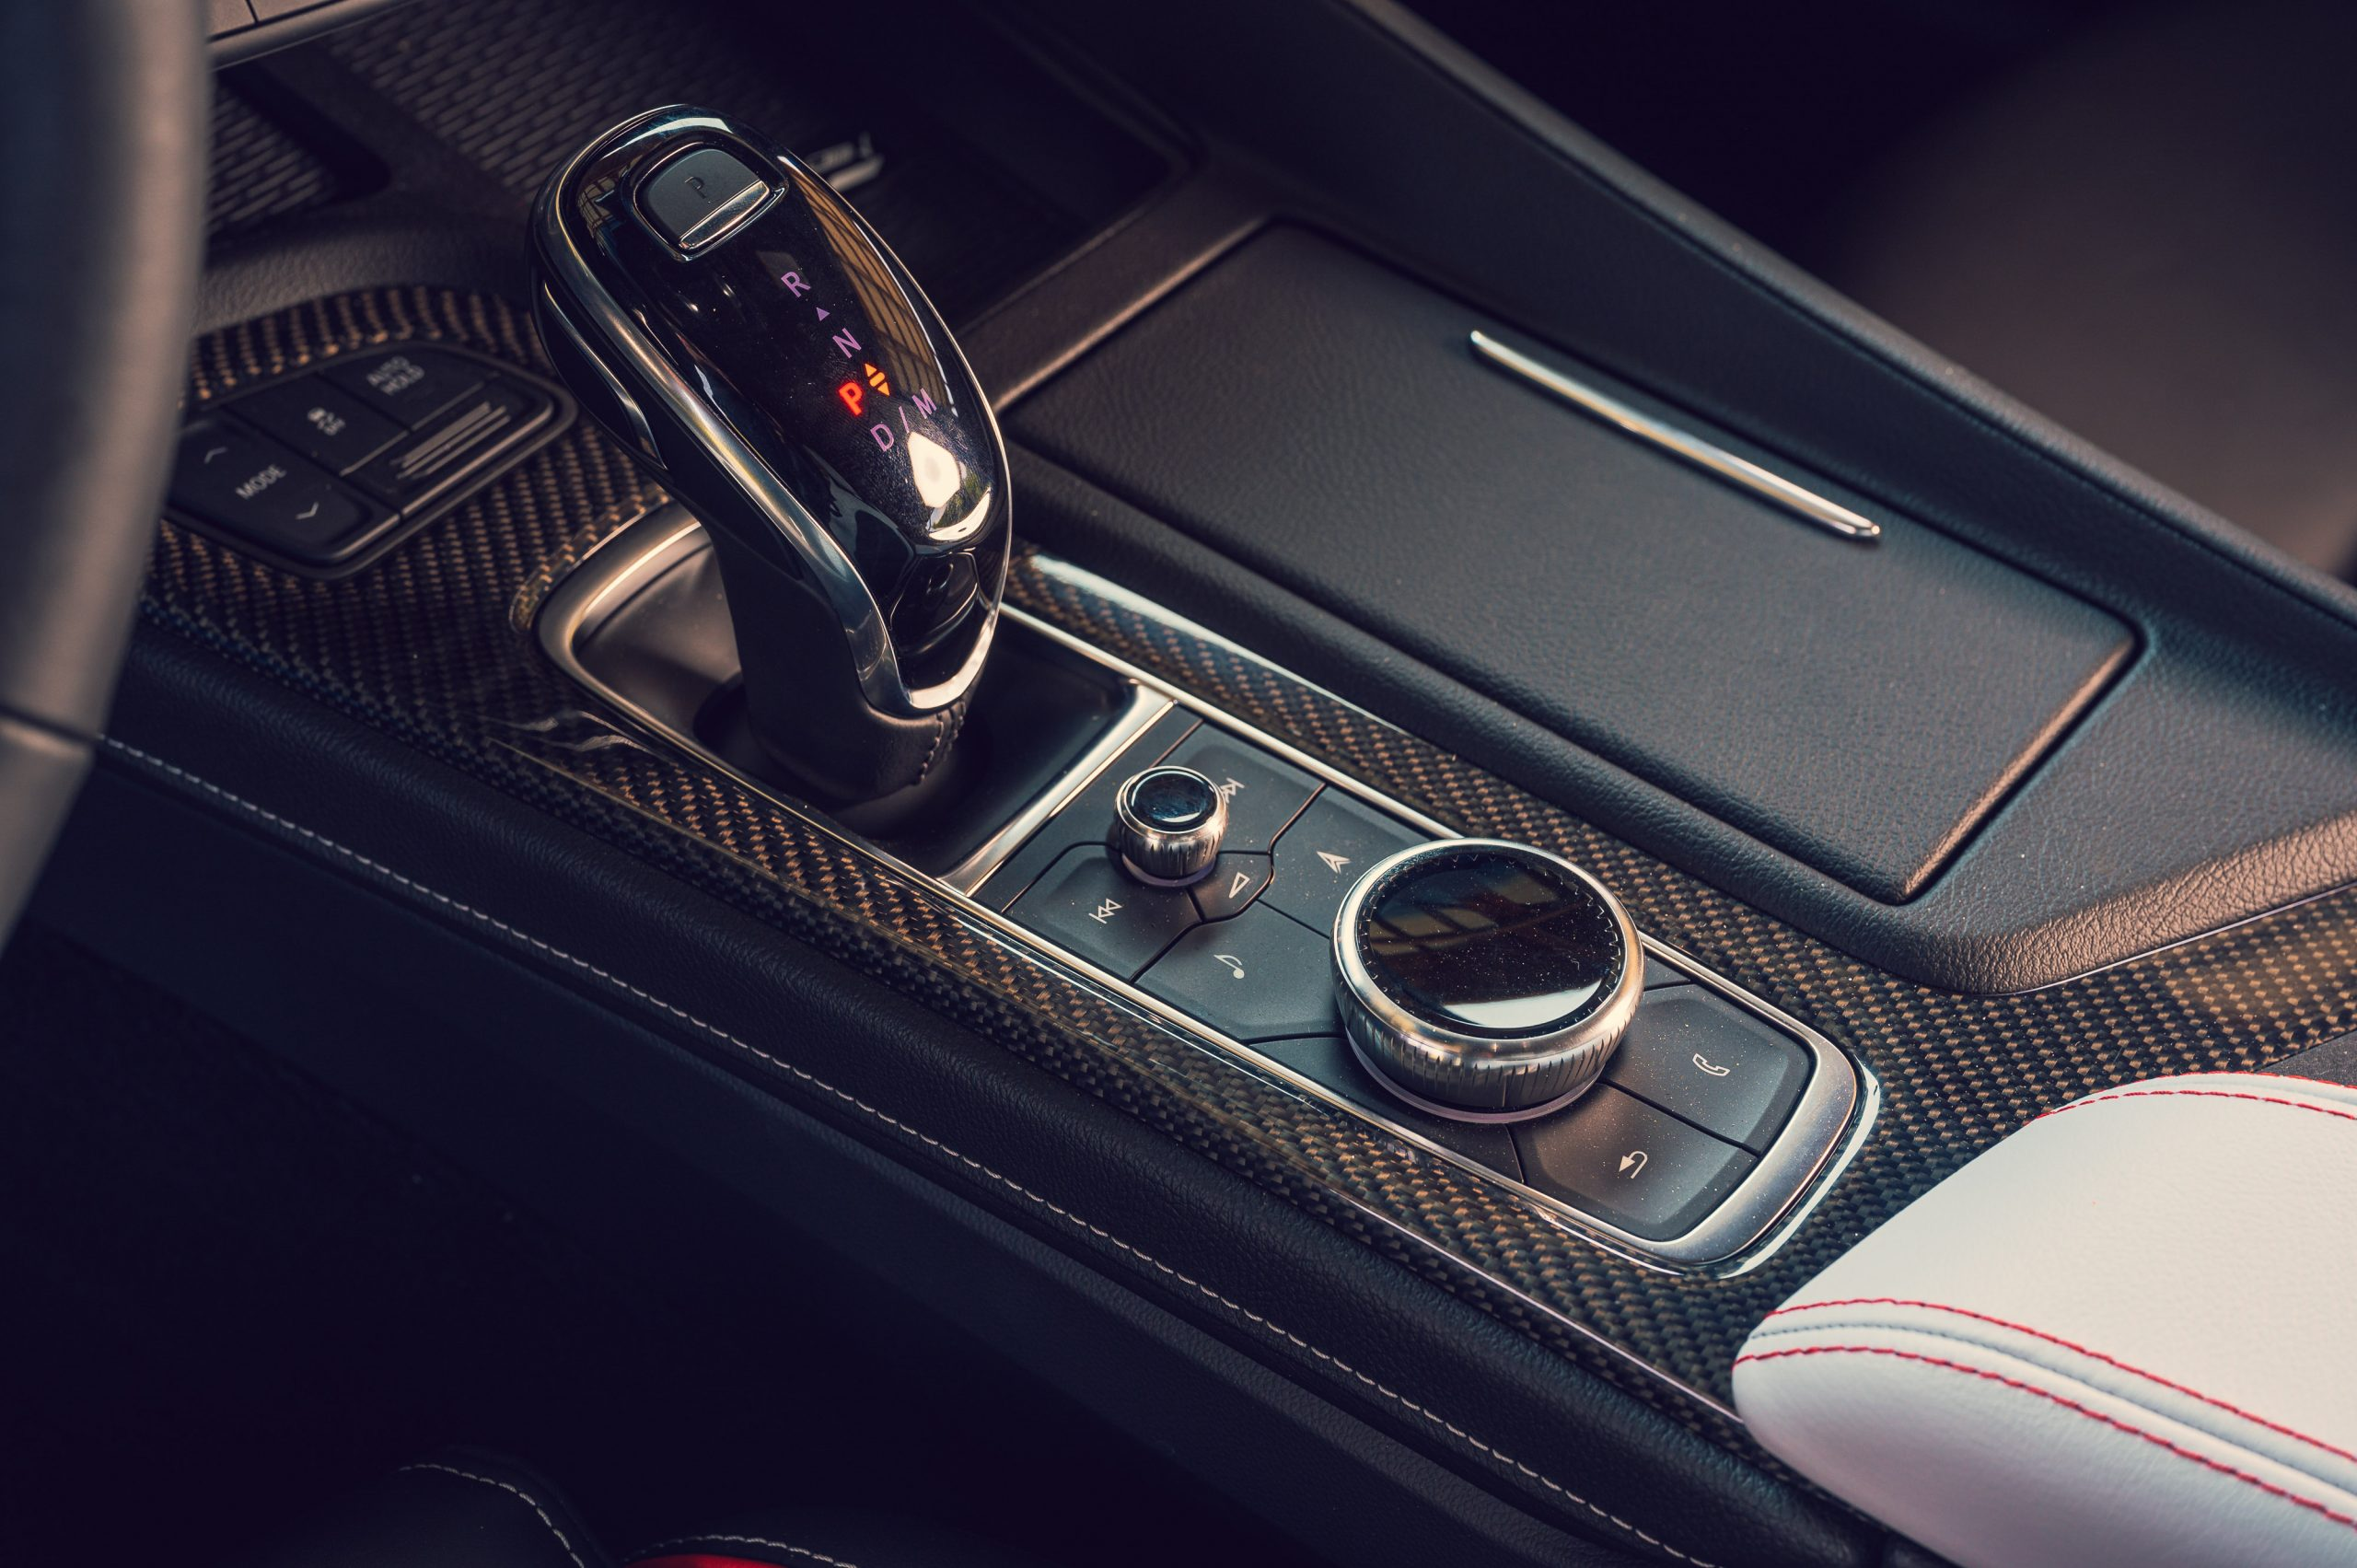 2022 Cadillac CT5-V Blackwing interior center console